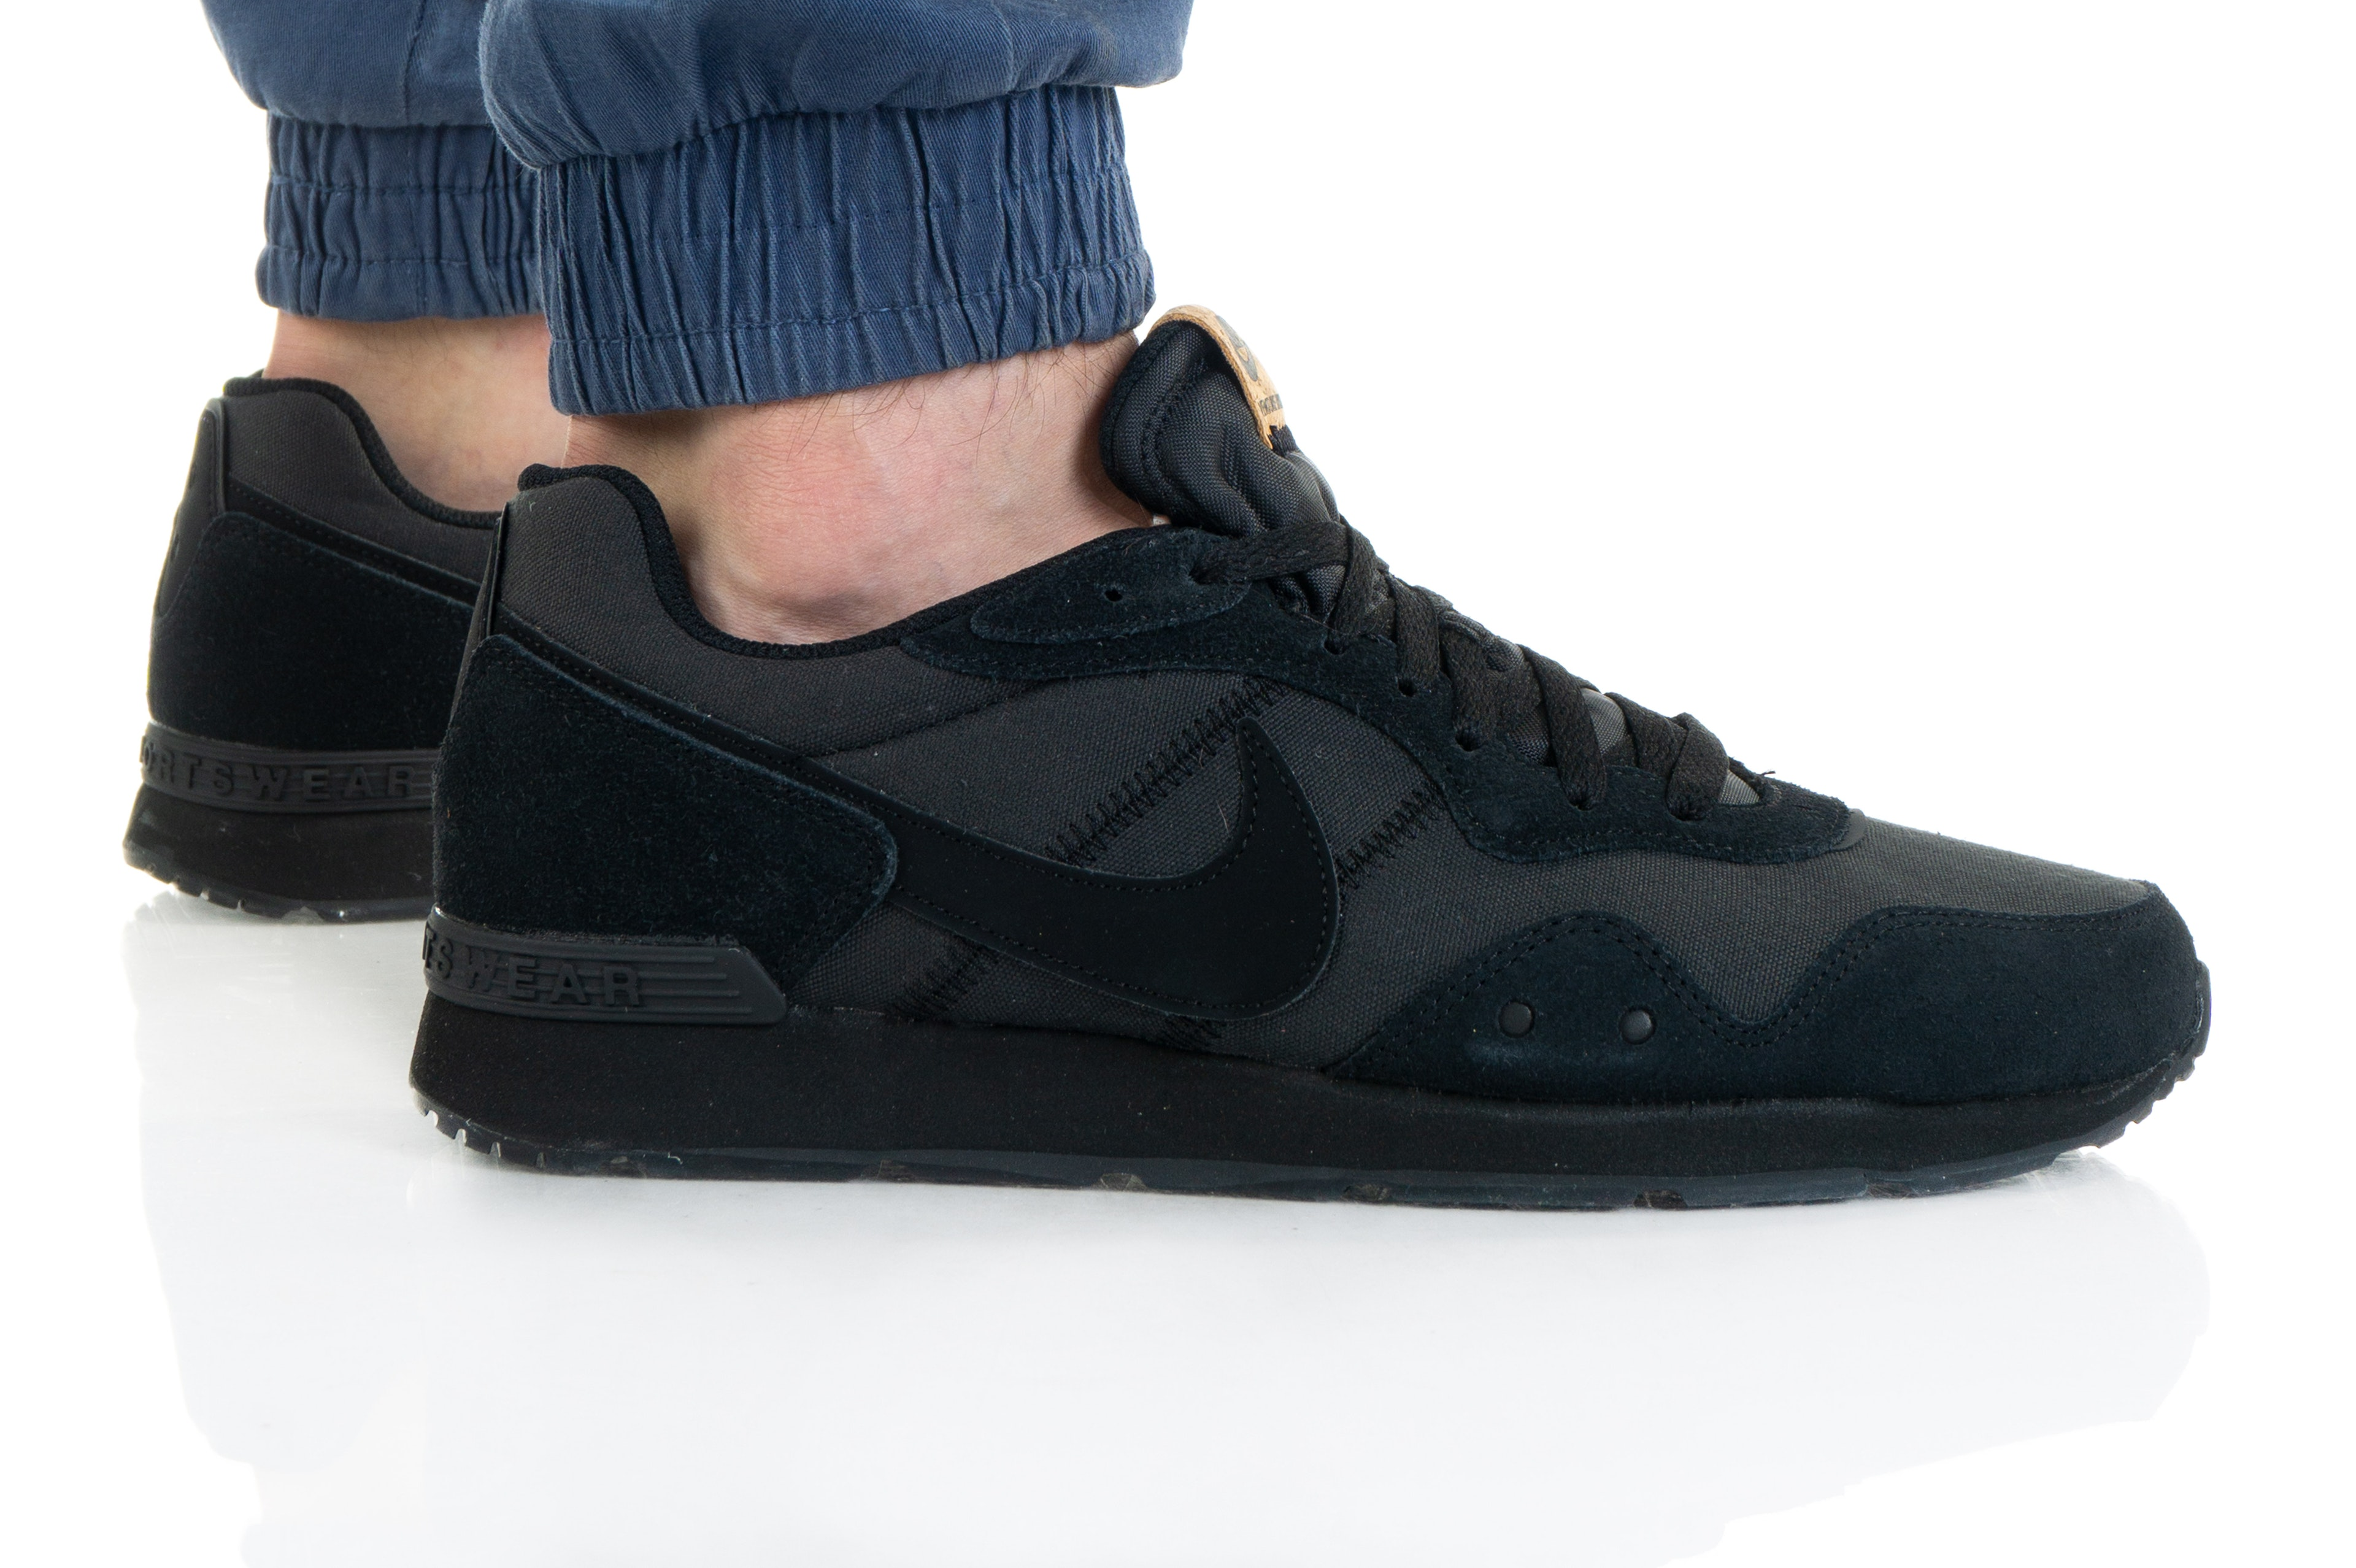 Nike VENTURE RUNNER DJ1969-001